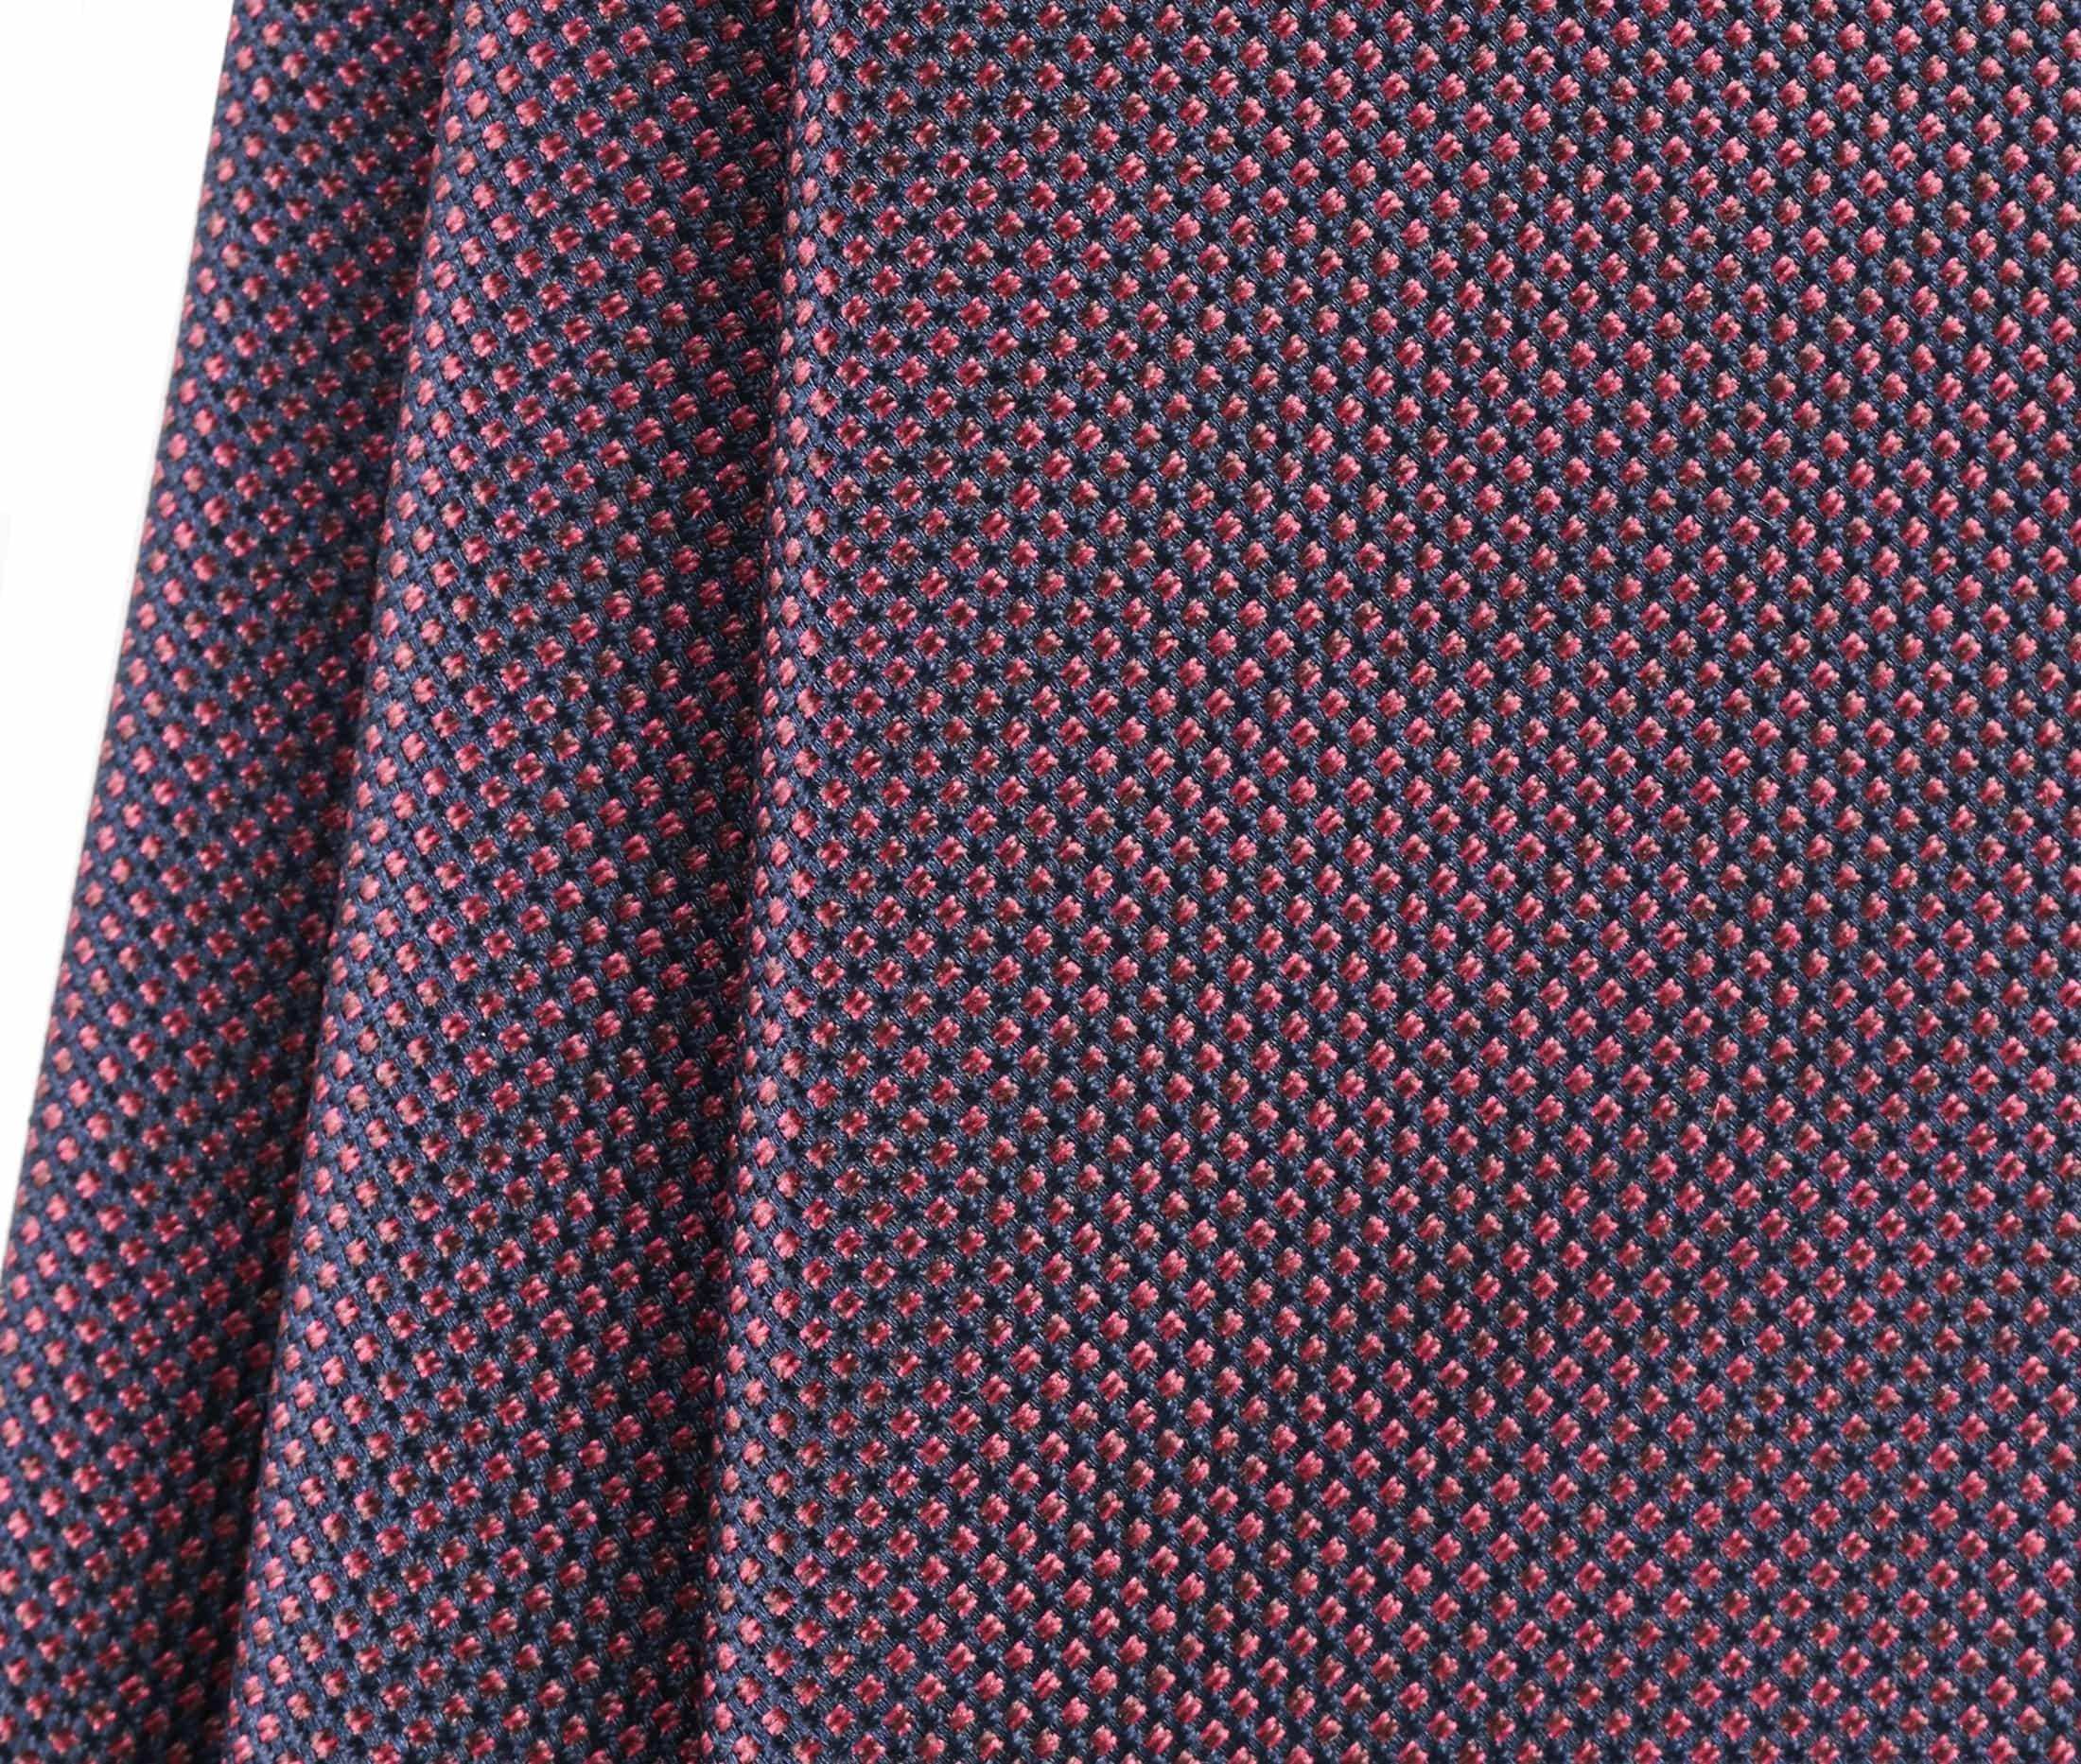 Krawatte Seide Pinpoint Bordeaux 9-17 foto 2